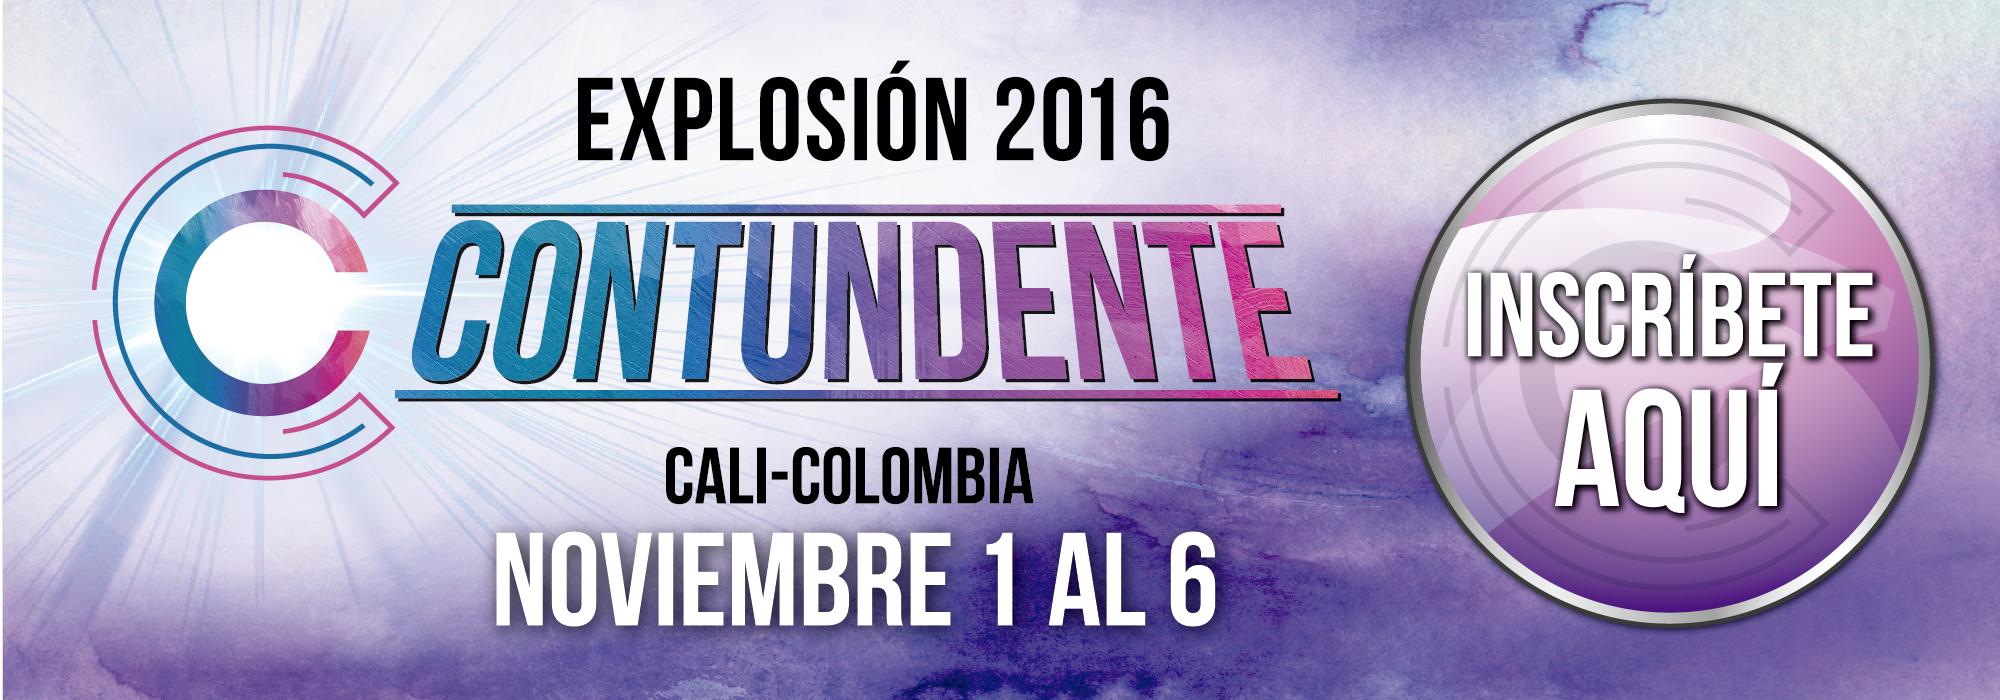 banner explosion 16-01